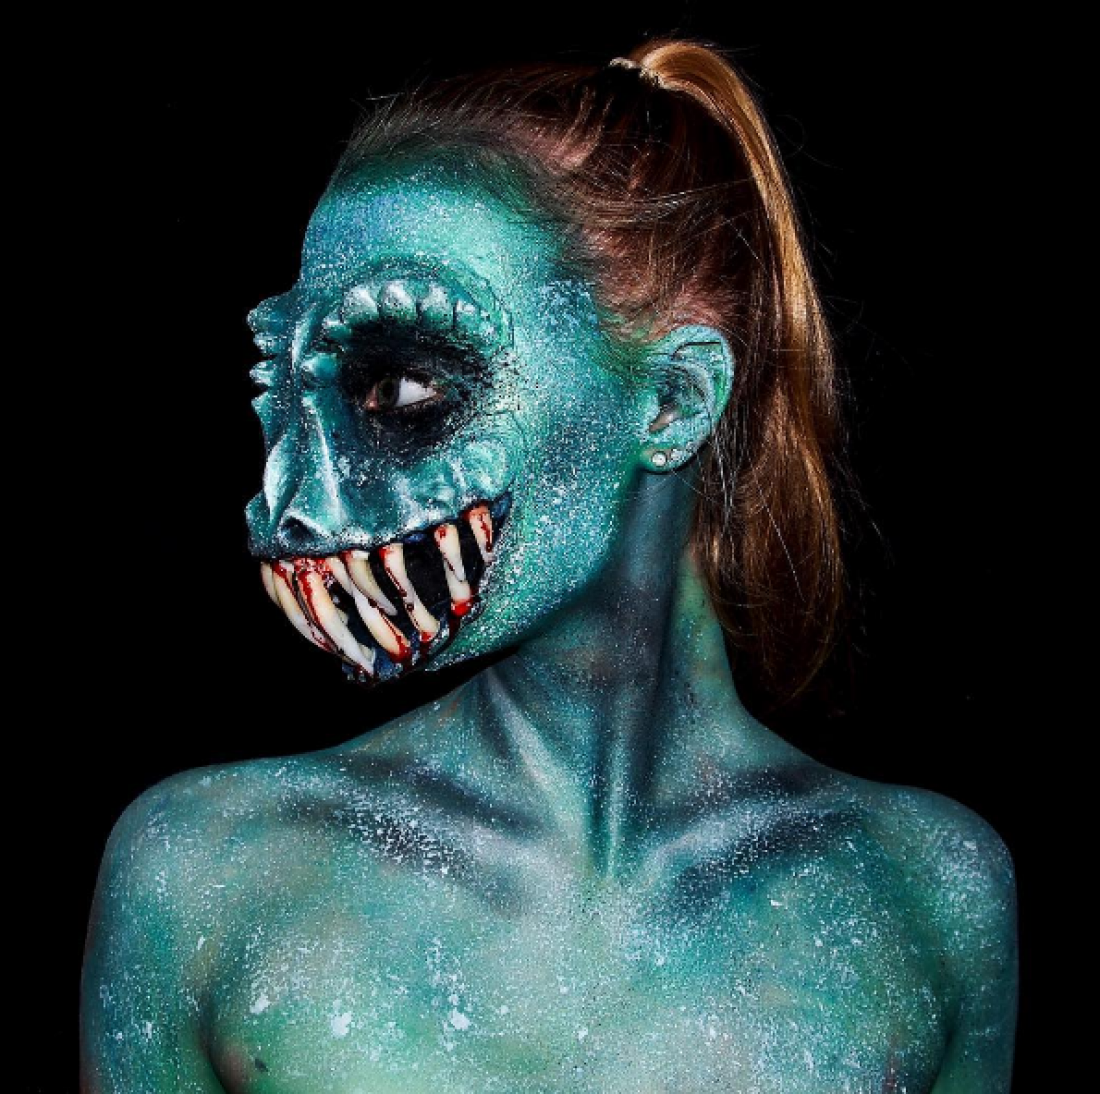 Лара Уирт в образе чудовища